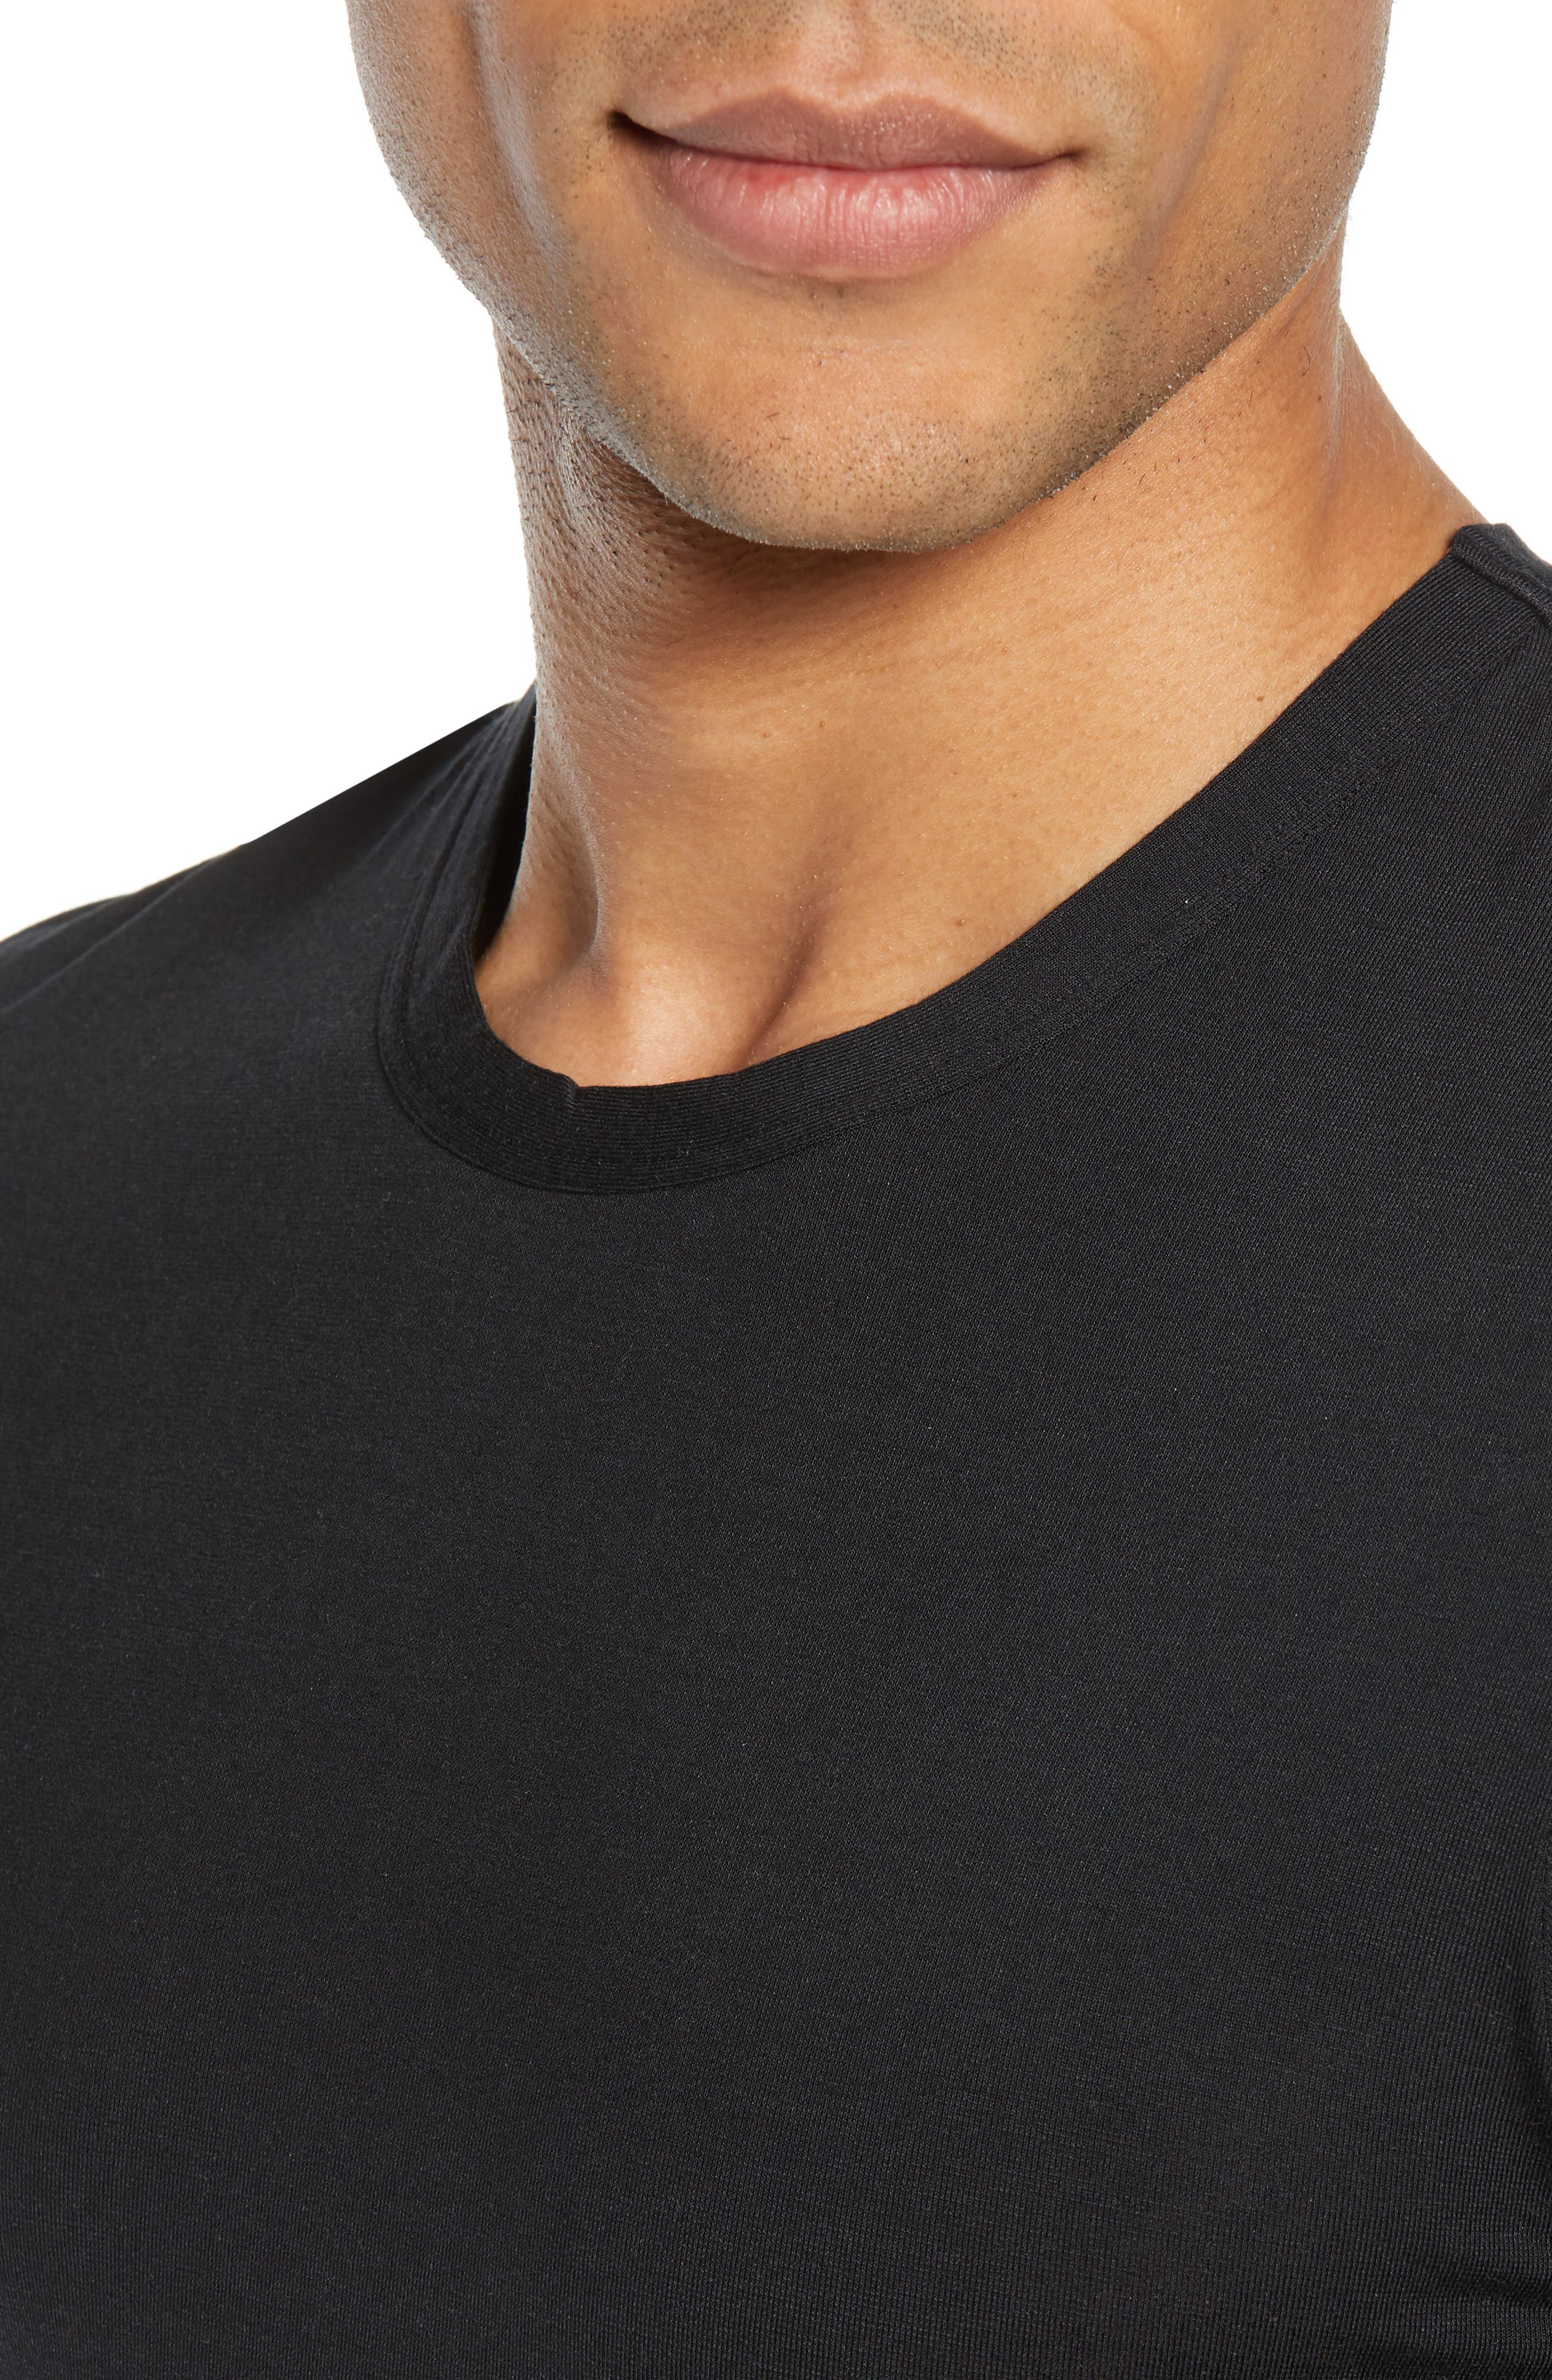 CALVIN KLEIN, Ultrasoft Stretch Modal Blend Crewneck T-Shirt, Alternate thumbnail 4, color, BLACK